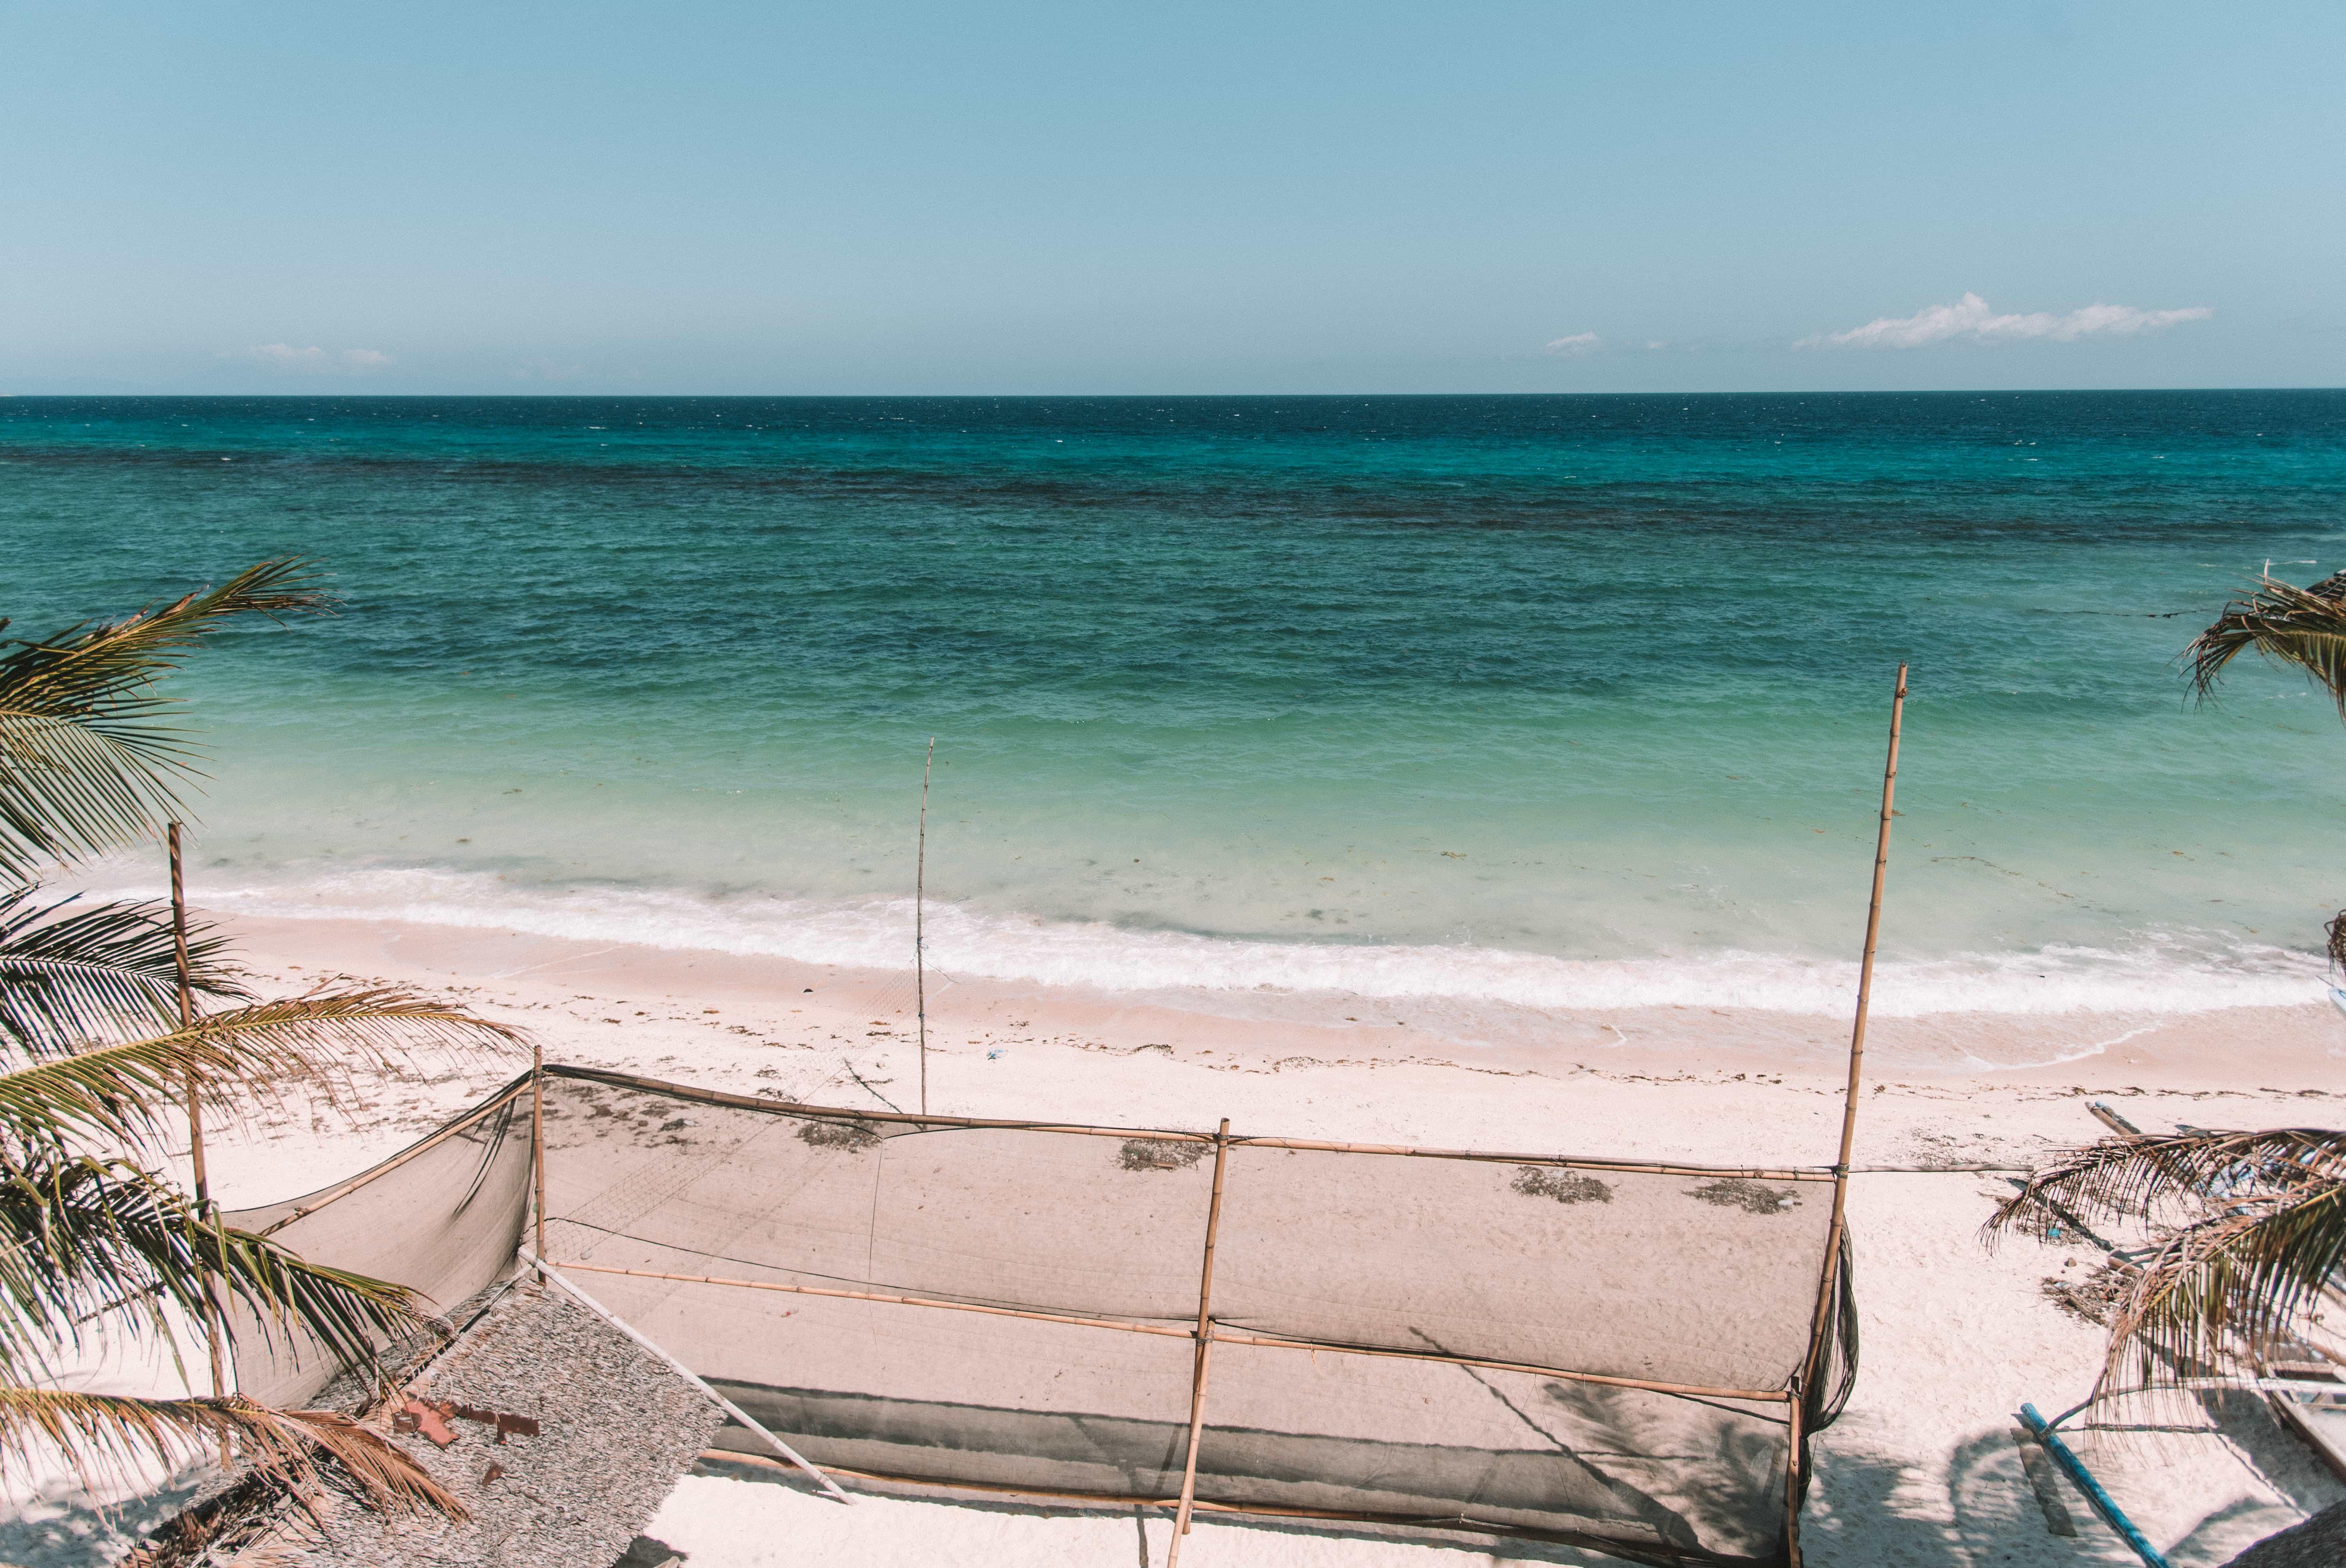 How to get to Carabao Island, Carabao Island travel guide, what to do in Carabao Island, Carabao Island